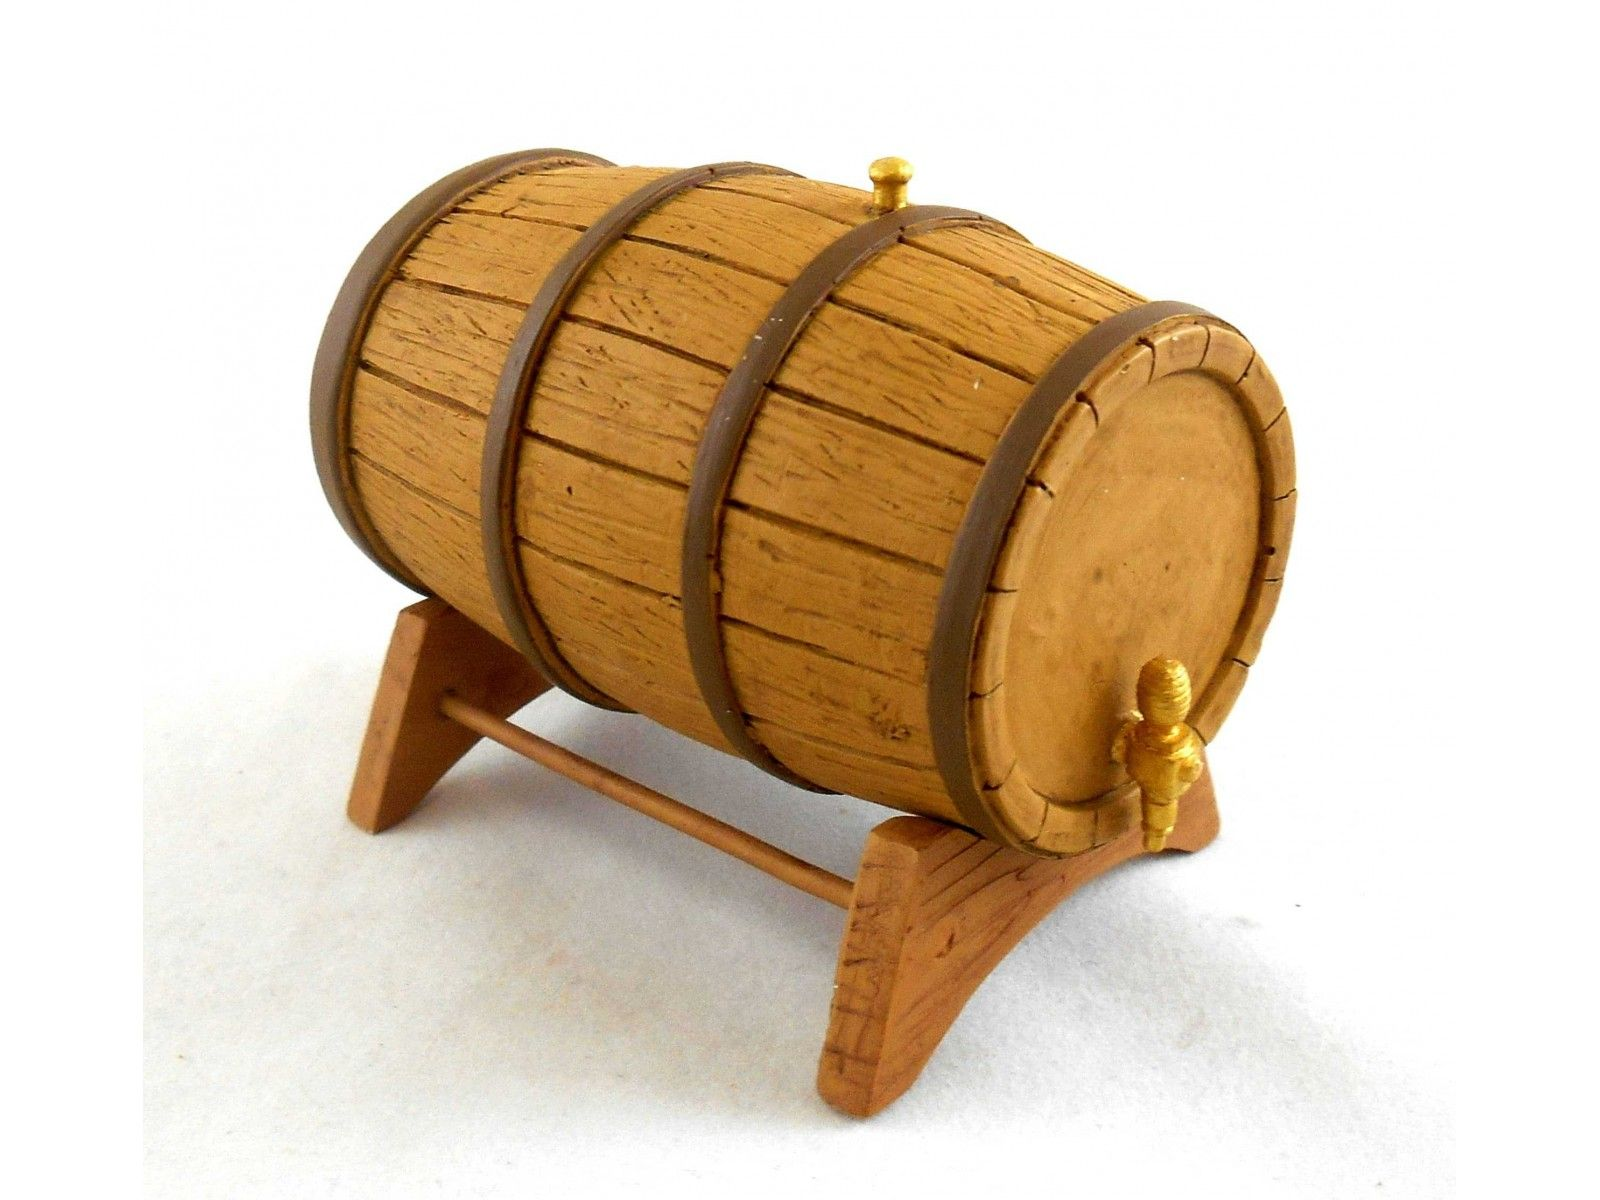 Dolls House Miniature Pub Furniture Large Wine Beer Barrel On Stand